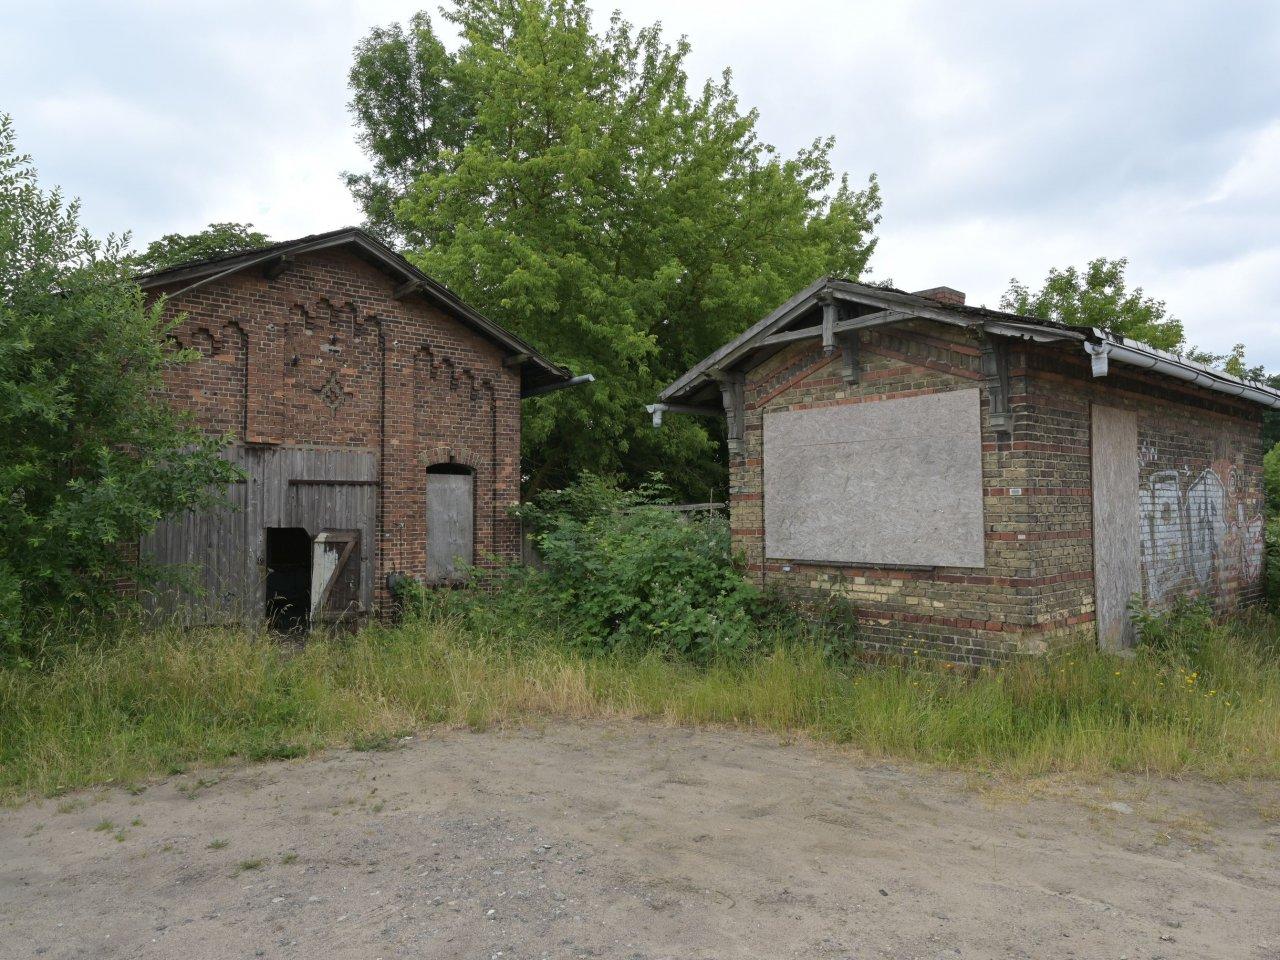 2 leerstehende ehemalige Werkstattgebäude in Ortsrandlage